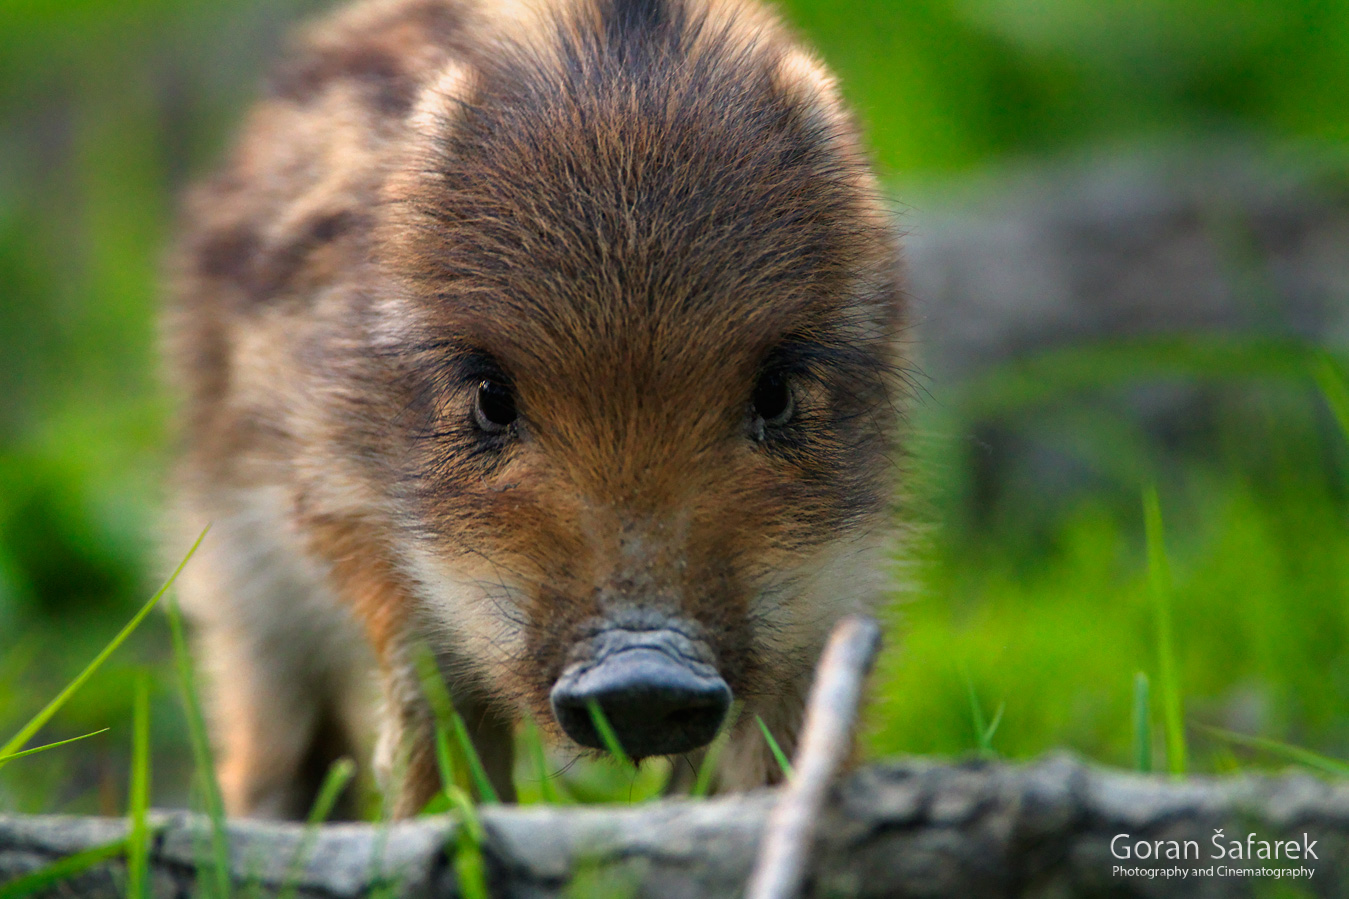 kopački rit, kopacki rit, croatia, baranja, slavonija, nature, floodplain, nature park, wild, wild boar, piglet